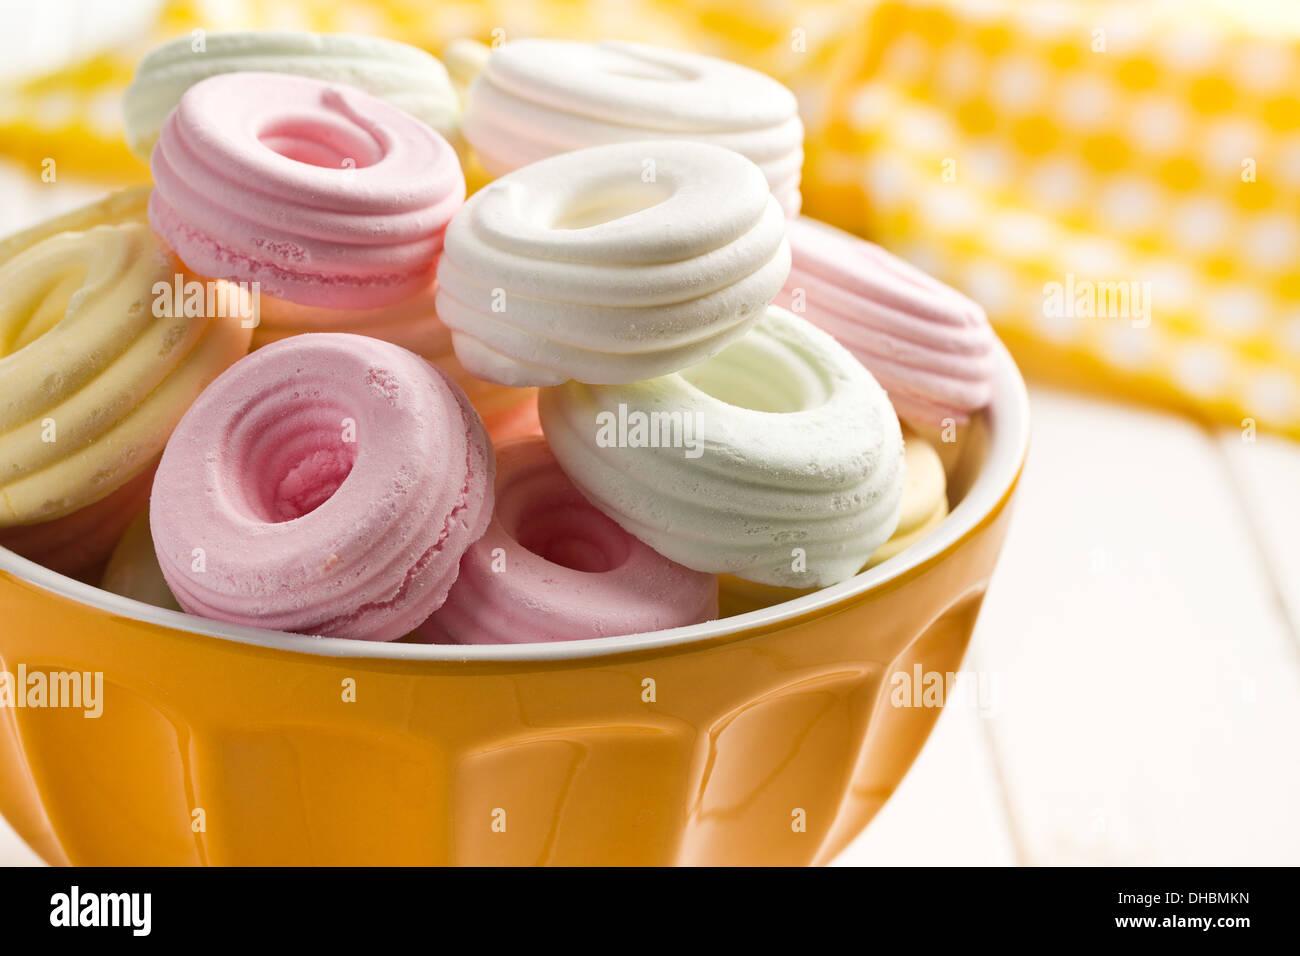 Meringhe colorate in vaso in ceramica Immagini Stock